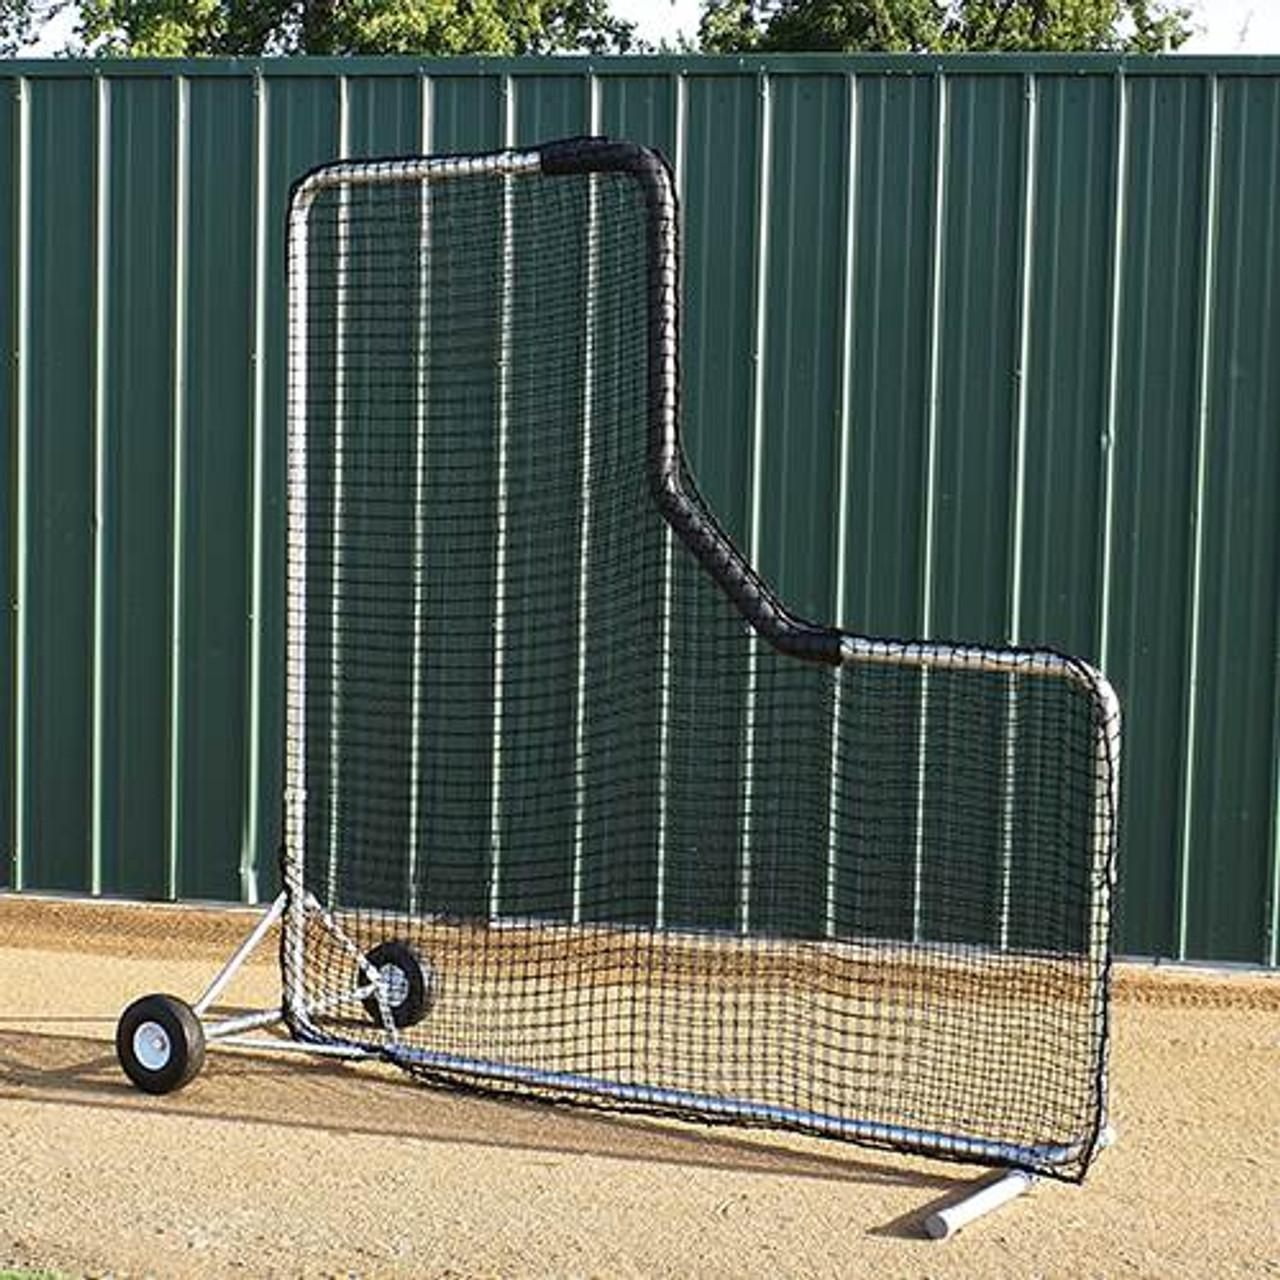 Baseball Protector Pro L-Screen Steel 8' x 8'